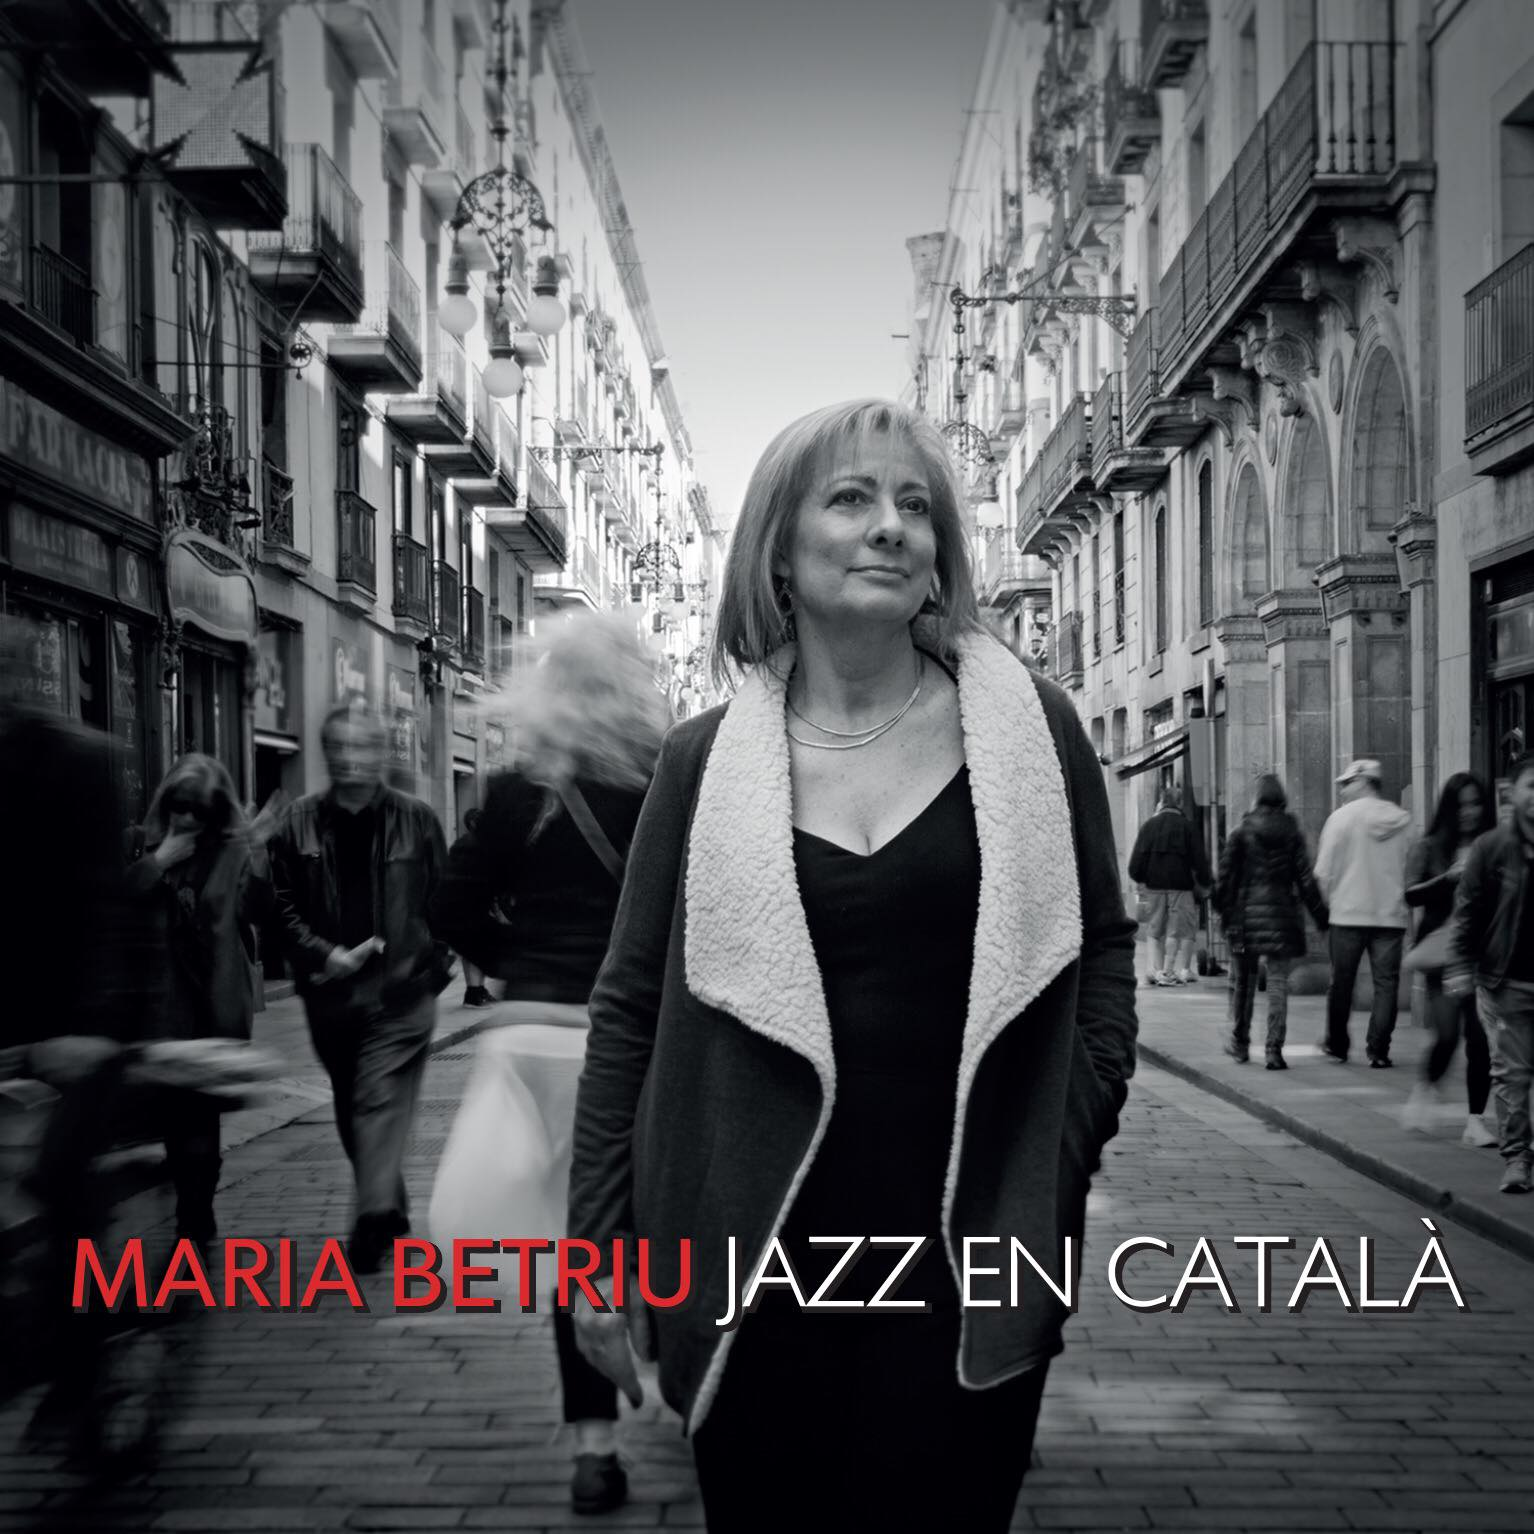 Maria Betriu